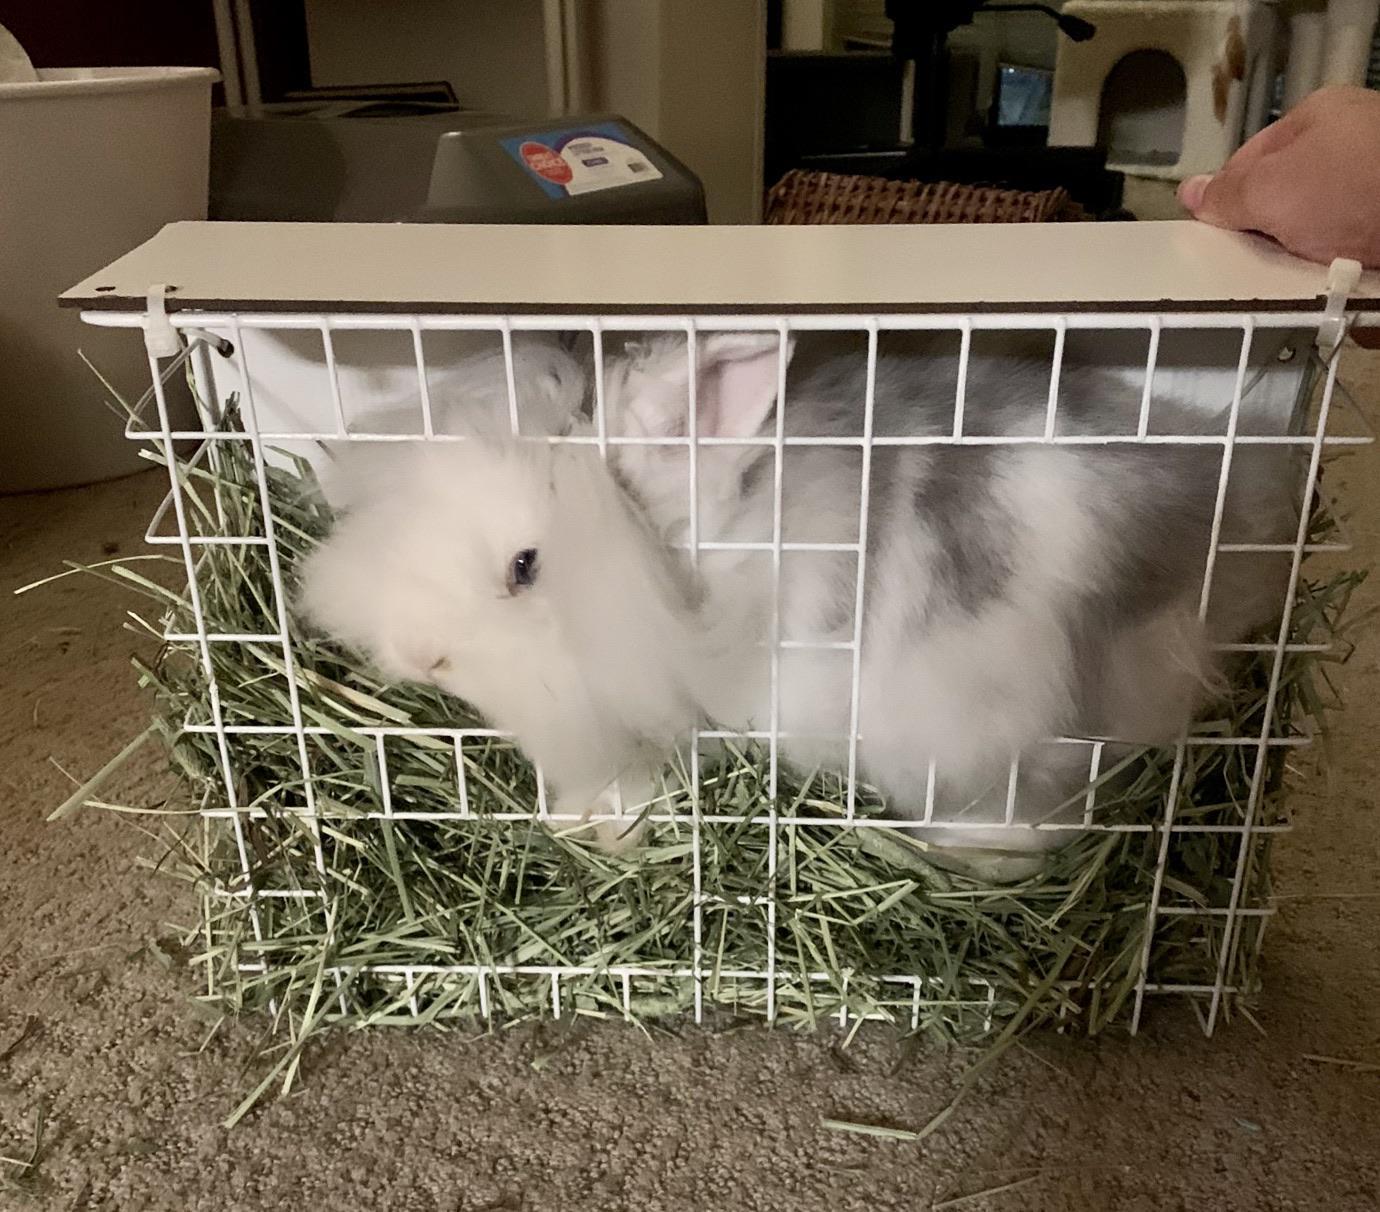 found her stuck in her new hay feeder